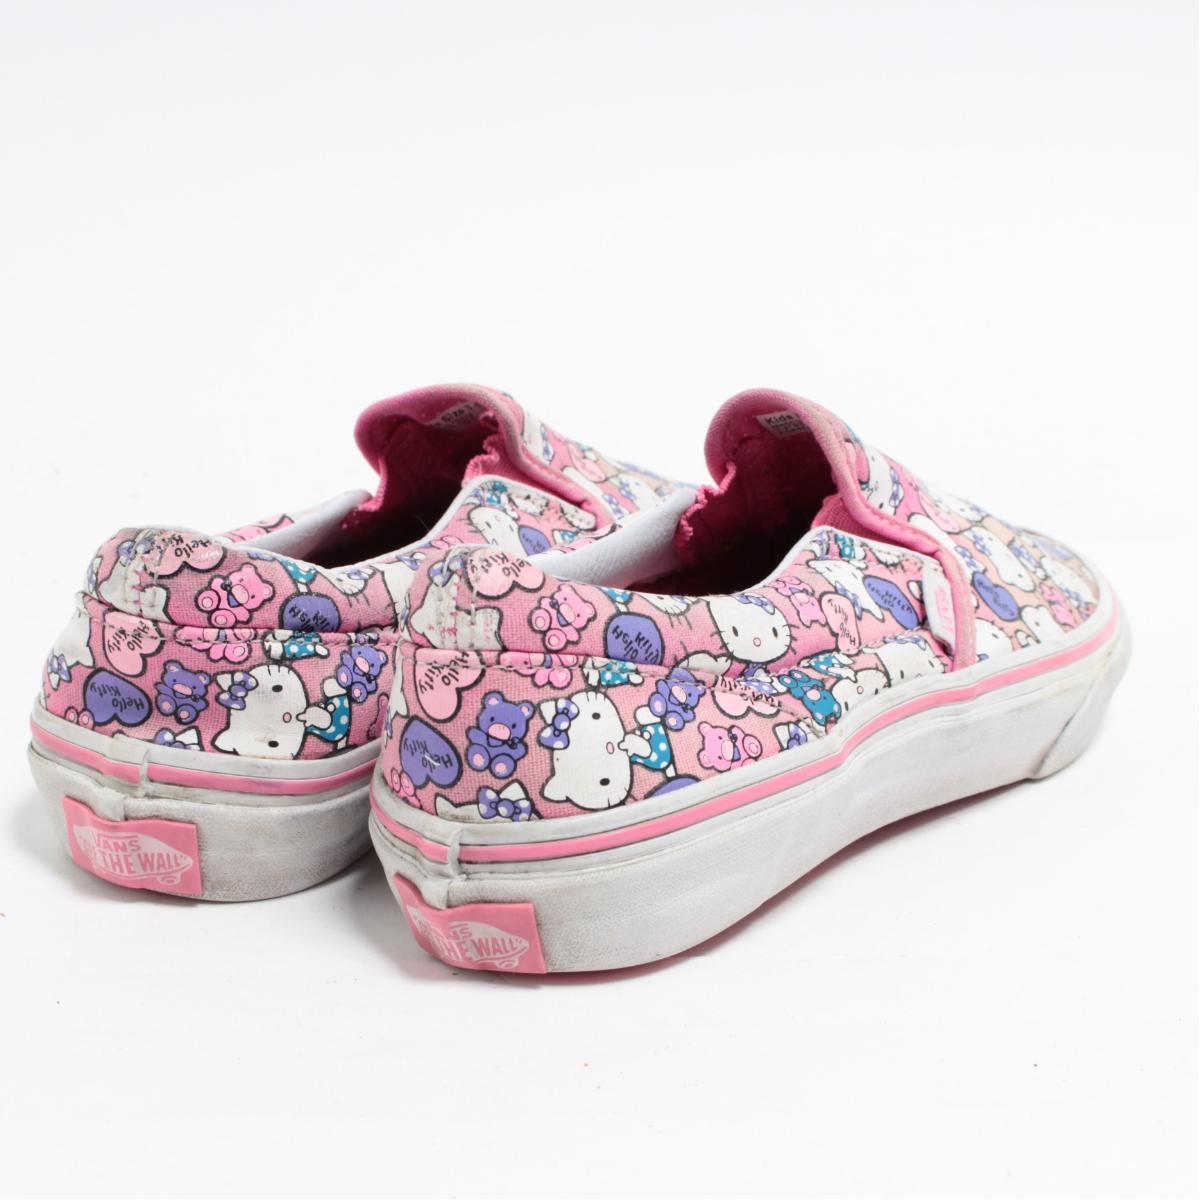 d32dc46a6 VINTAGE CLOTHING JAM: Vans Hello Kitty VANS Hello Kitty SLIP-ON slip ...